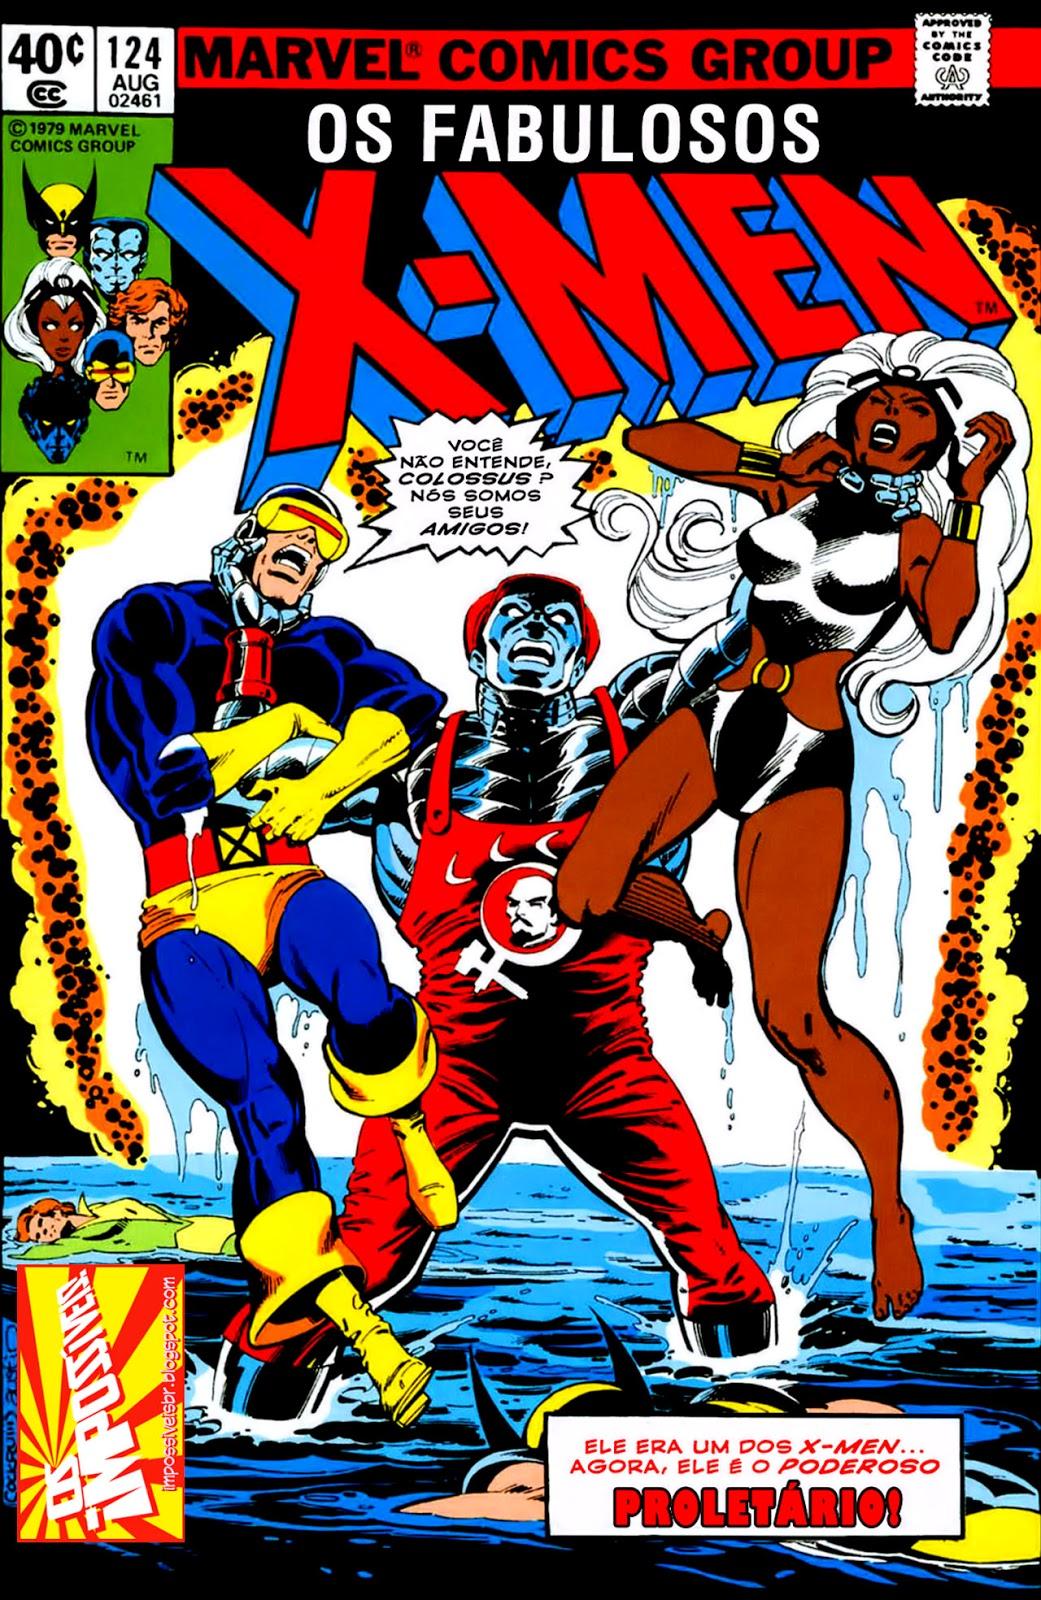 http://www.mediafire.com/download/3uwui7arzcdnmuq/Os.Fabulosos.X-Men.(X-Men.V1).124.HQBR.14NOV13.Os.Impossiveis.cbr